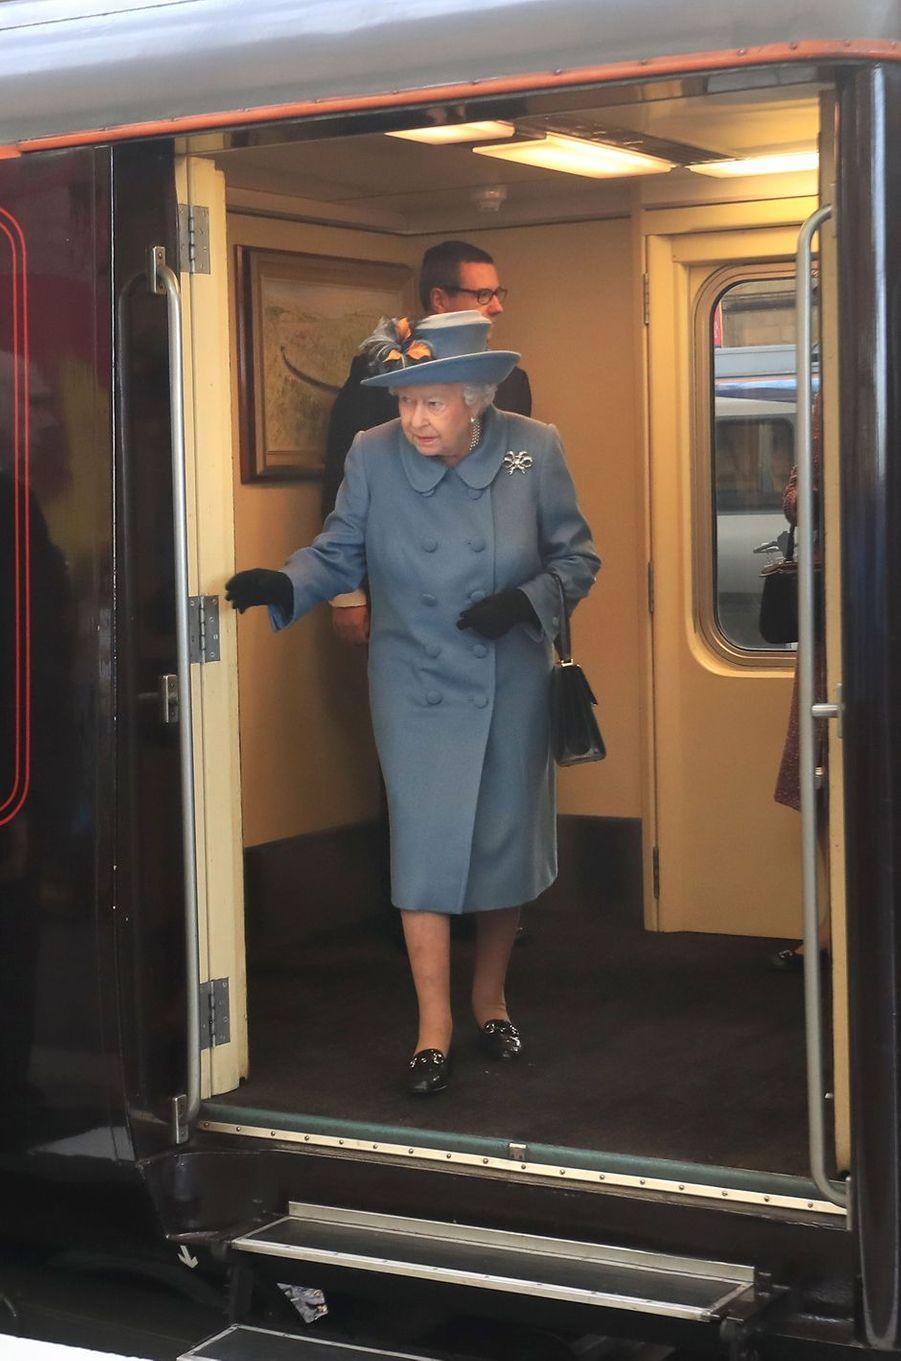 La reine Elizabeth II arrive en train à Kingston-upon-Hull, le 16 novembre 2017